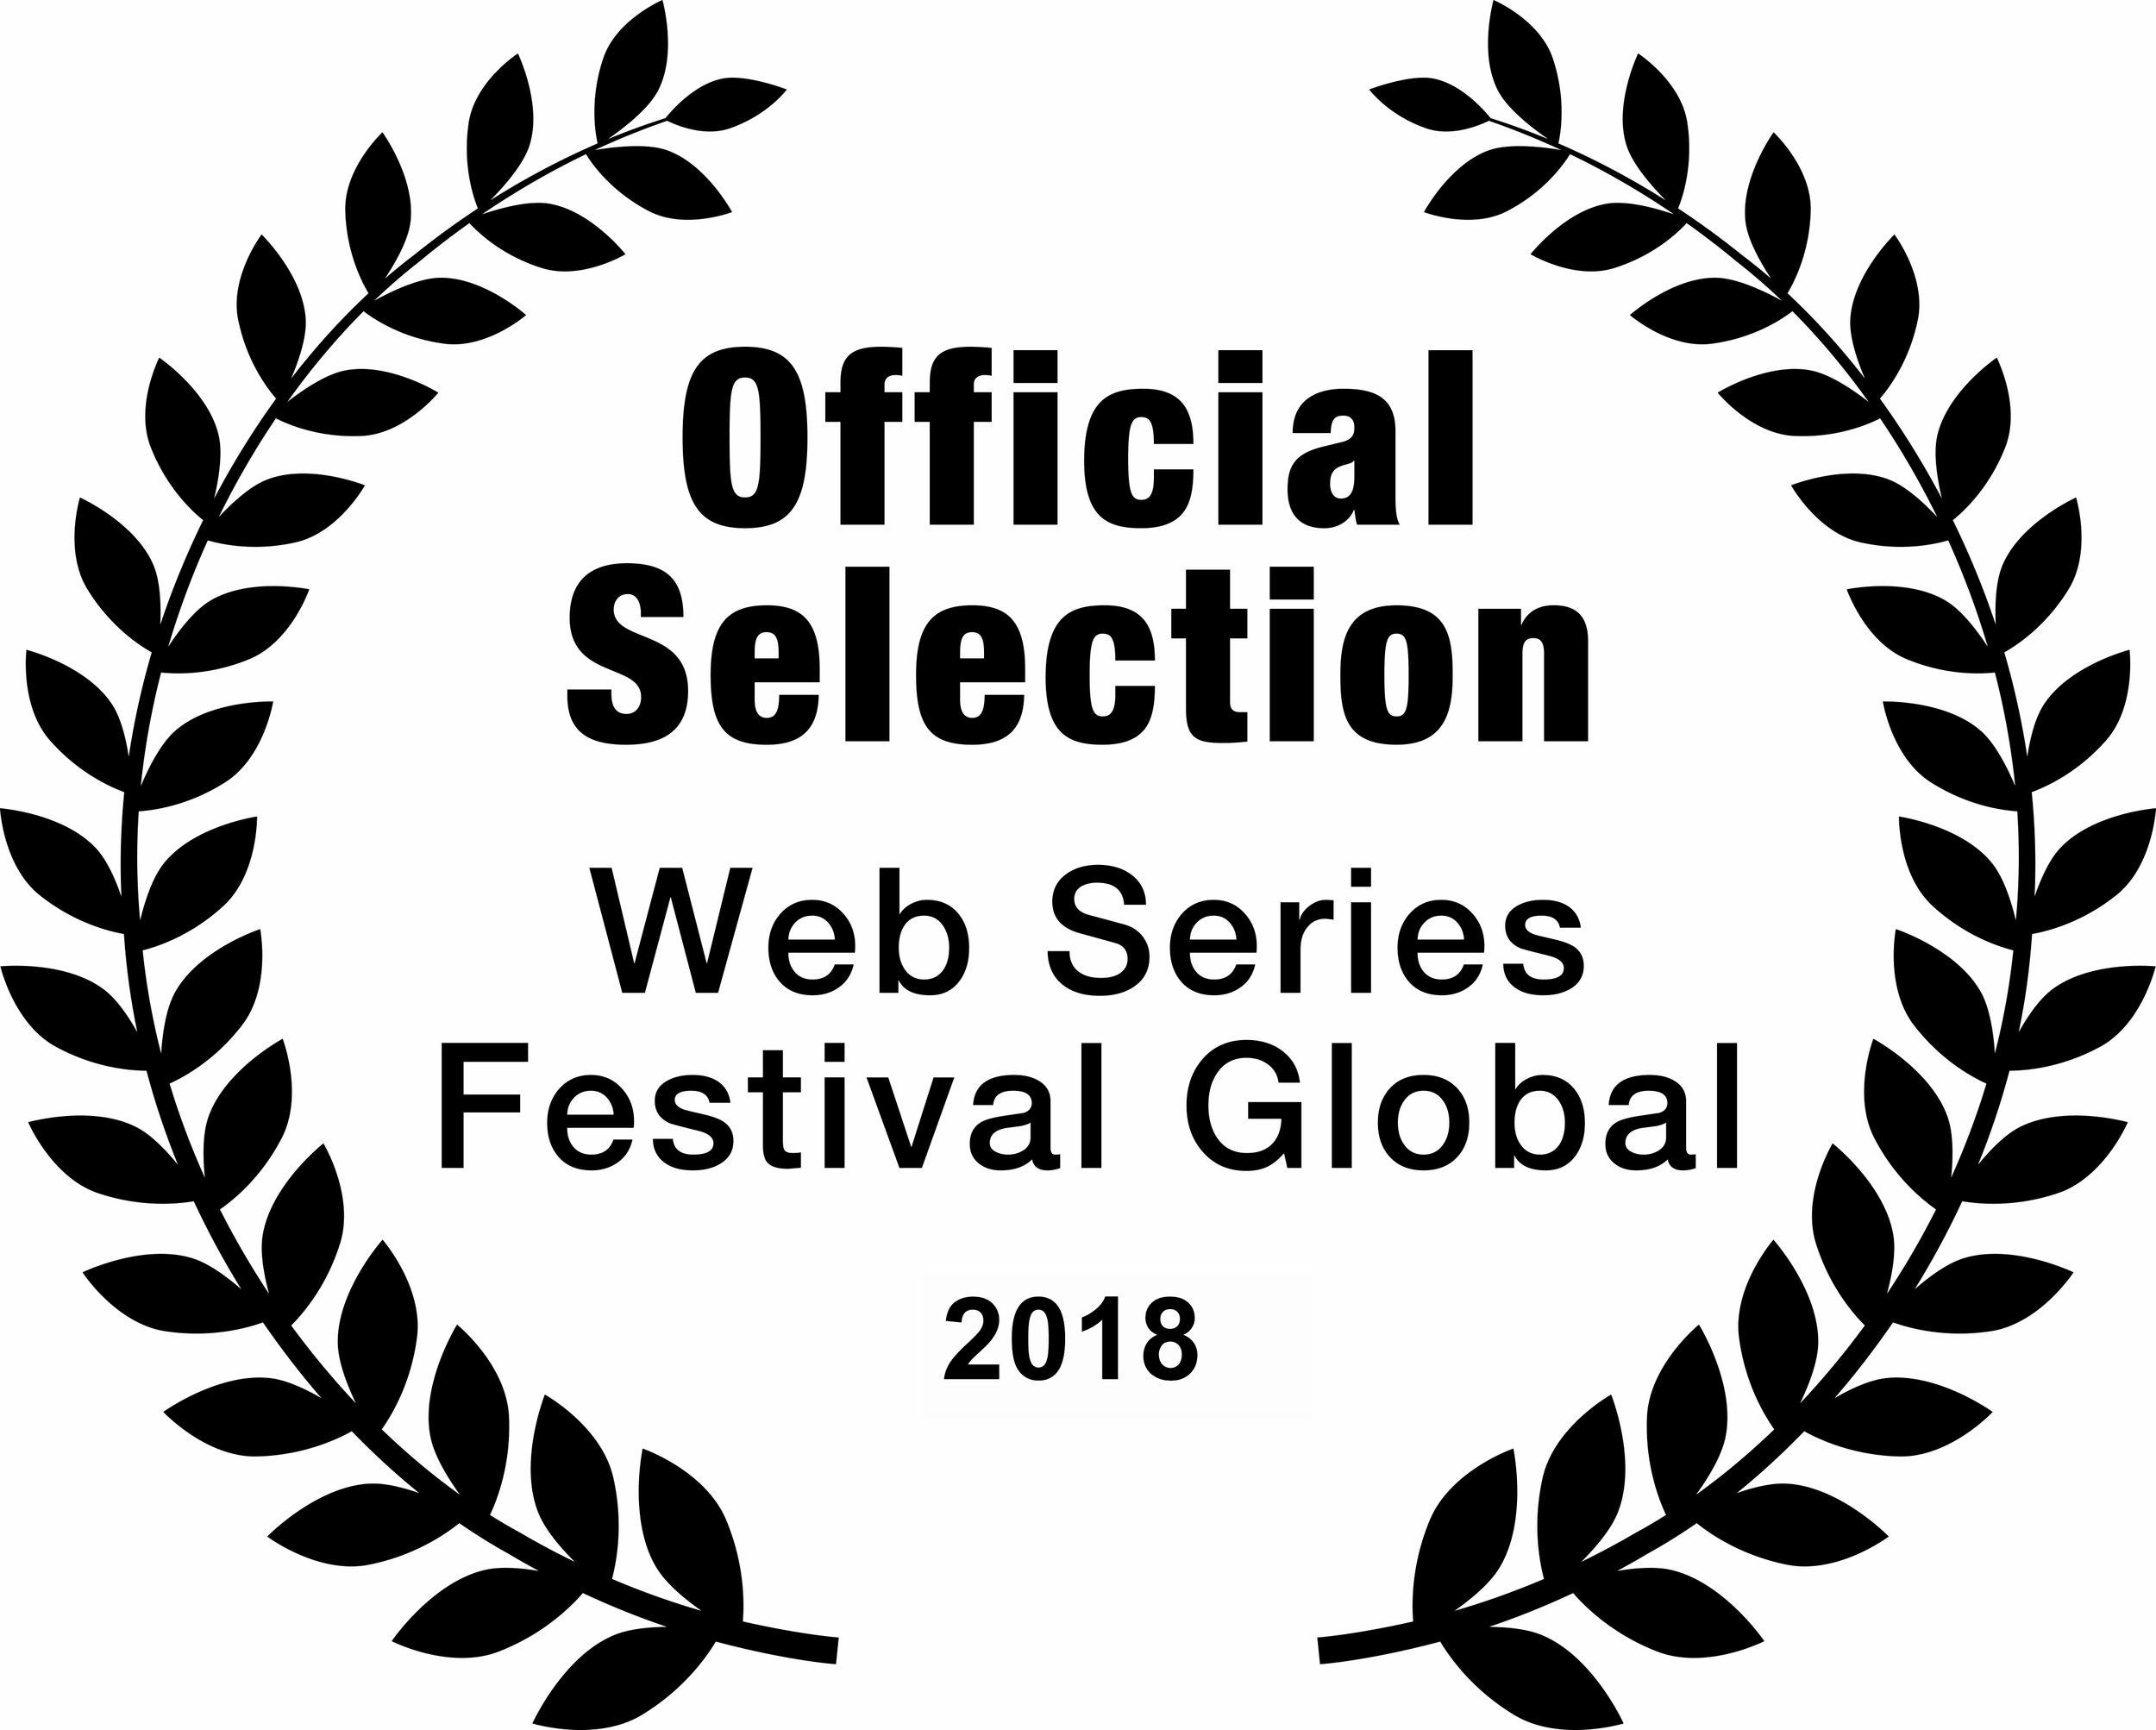 2018 web series festival global official selection laurels copy.jpg